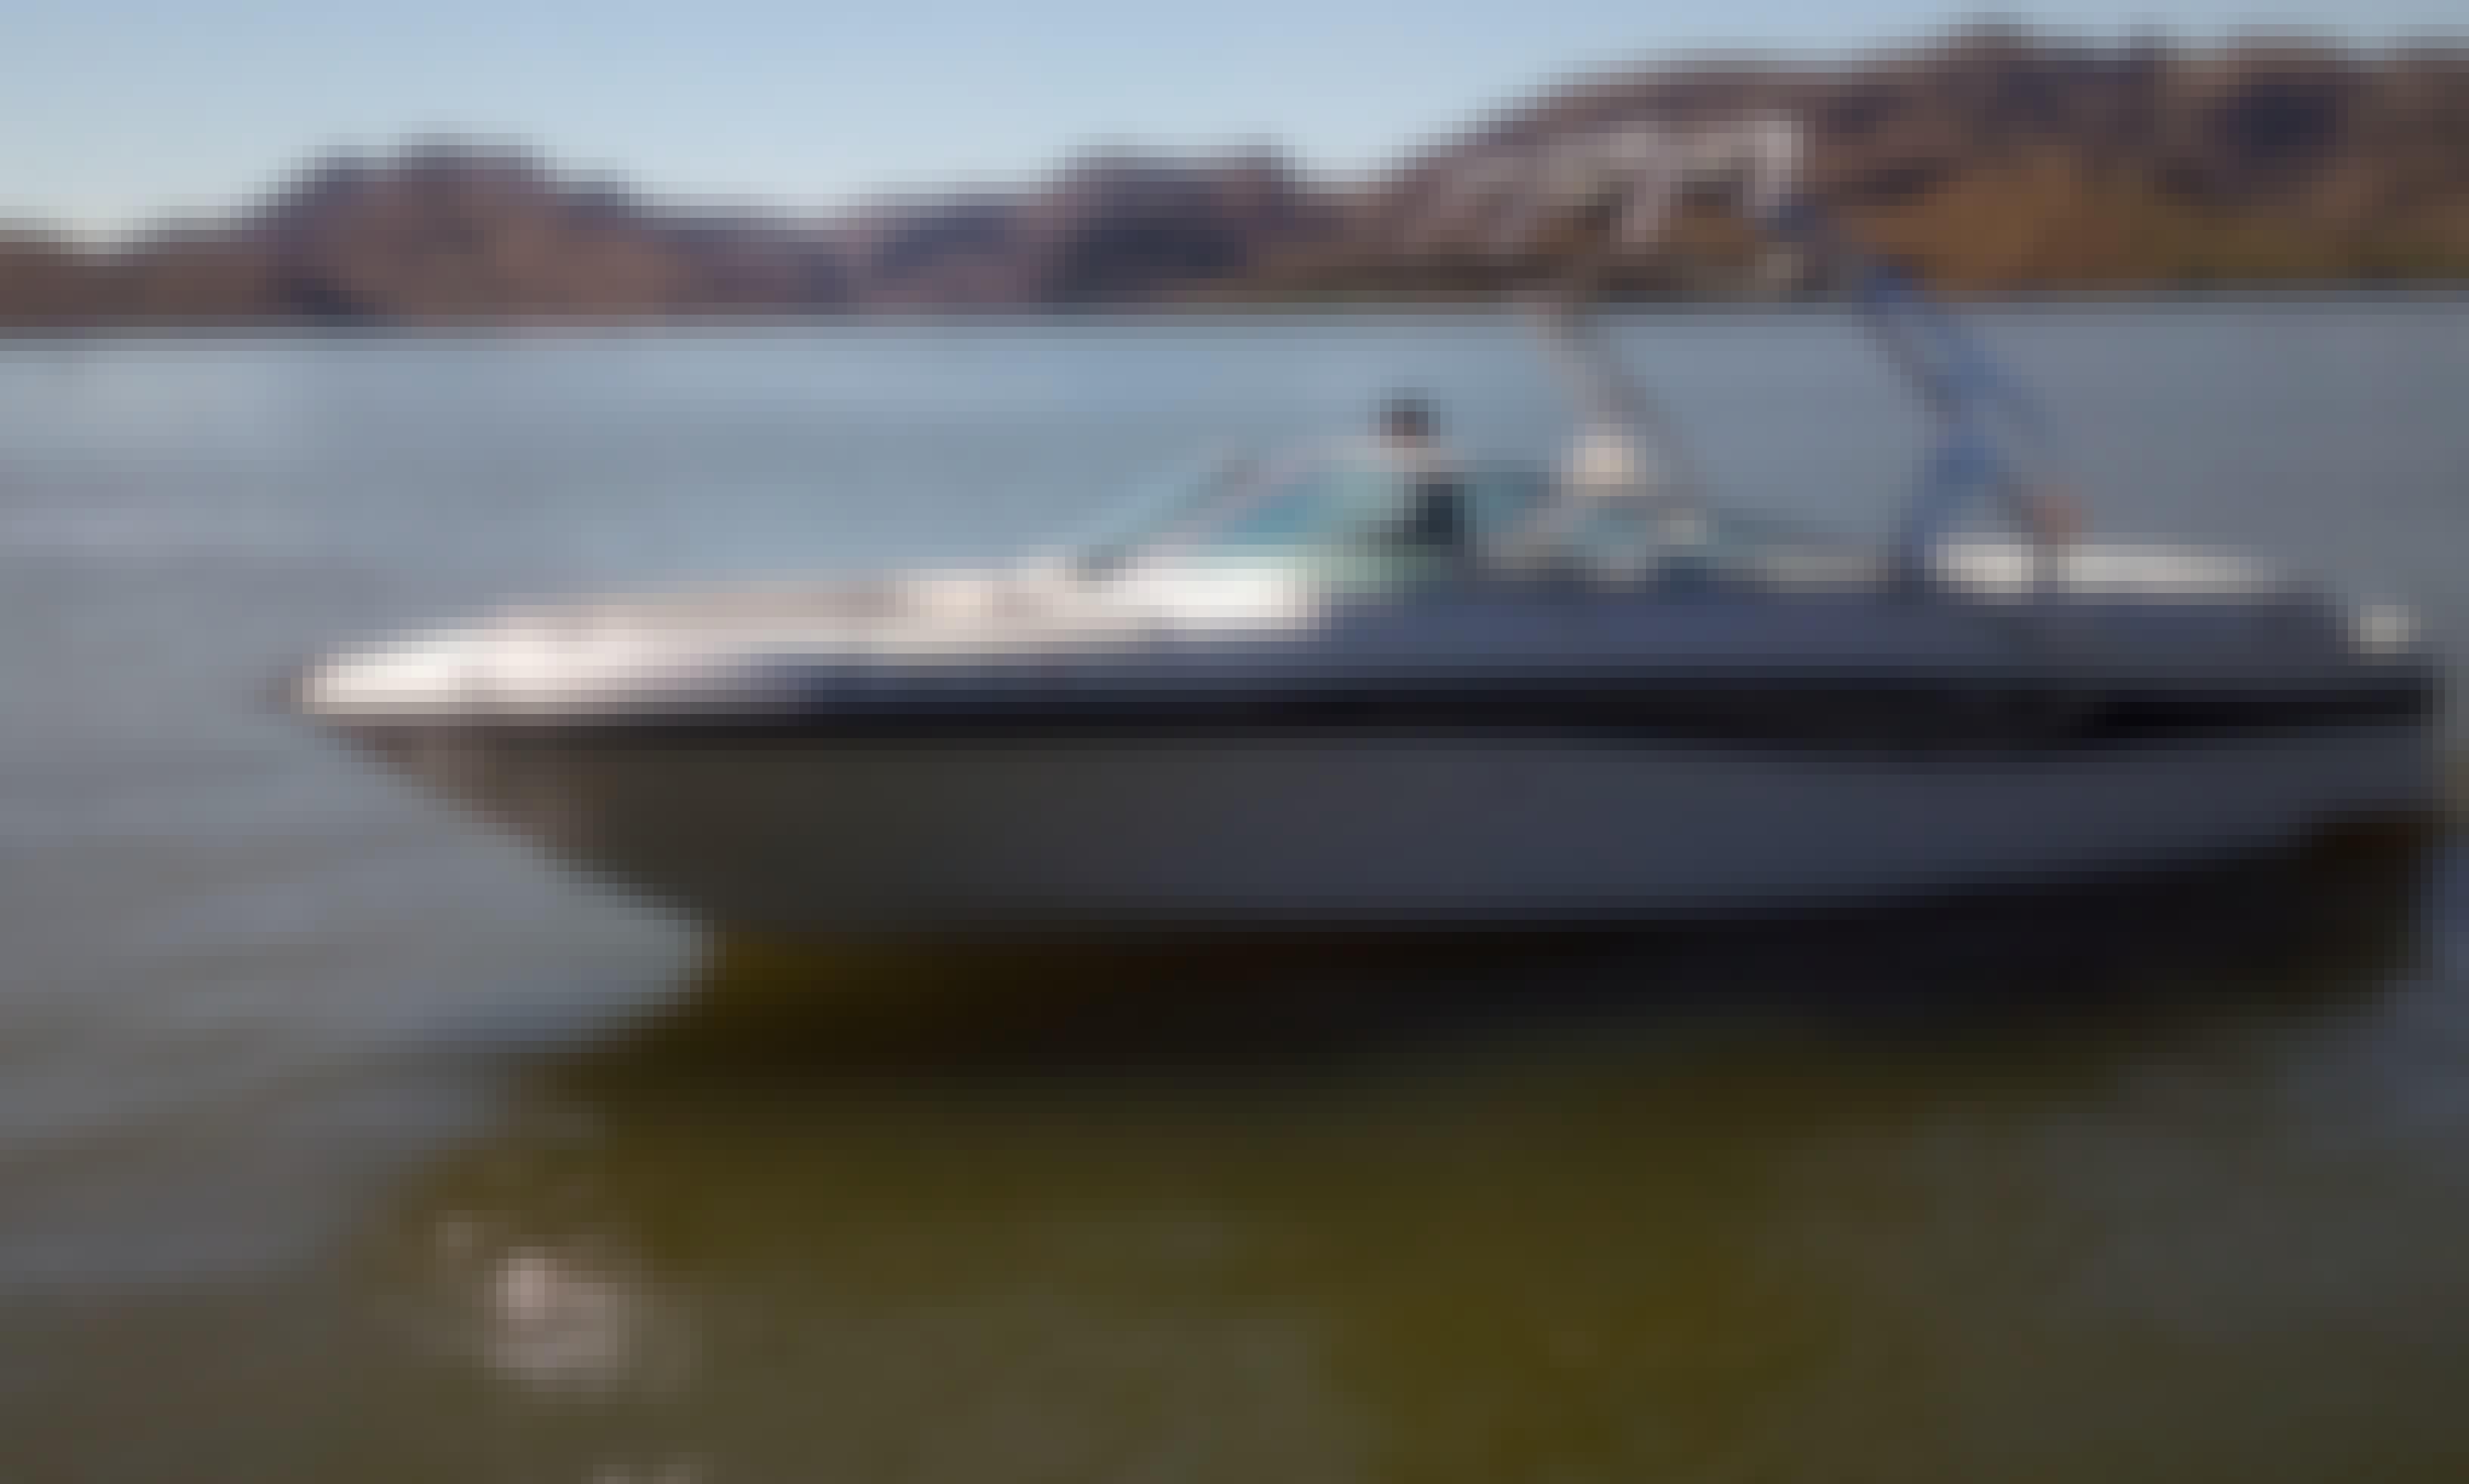 26' Fourwinns Bowrider - Seats 11 Person in Roosevelt, Arizona